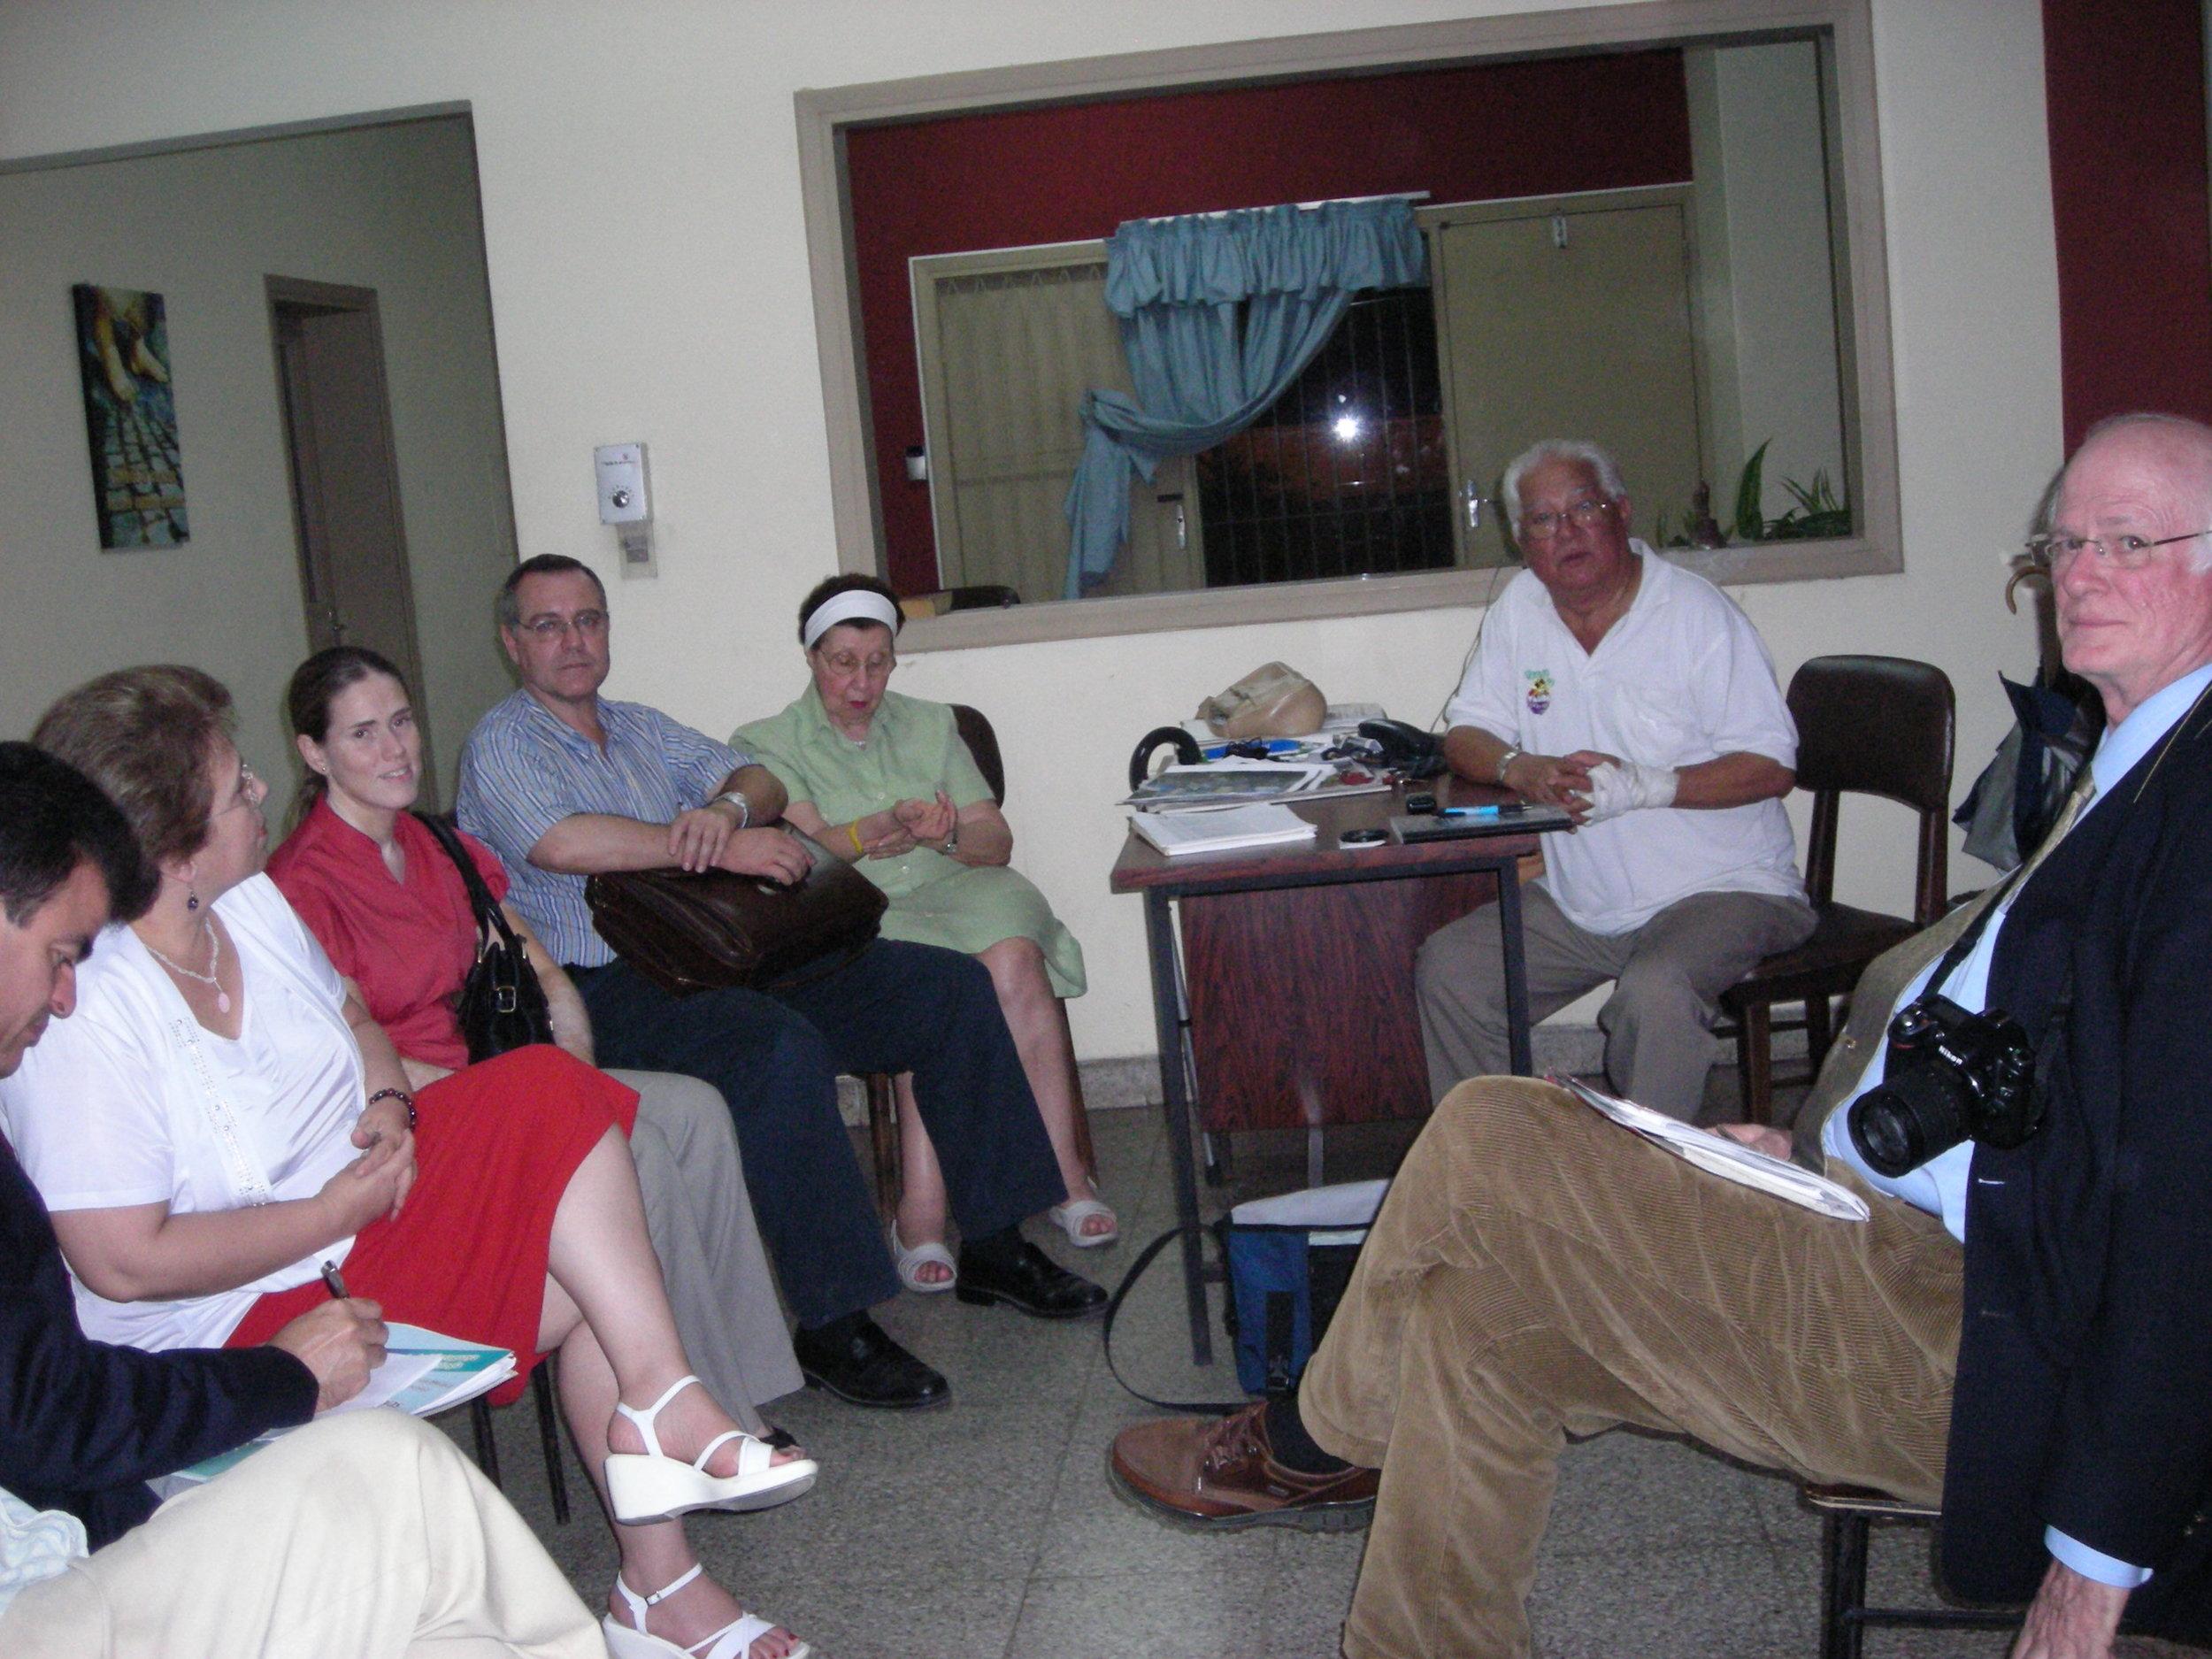 Project C.U.R.E. presentation to E. Lezcano,Dra.L Quintana, Dra. L. Fontclara, Ing. C. Lopez, Ms. Marta Bosio, Pbro. B. Paez